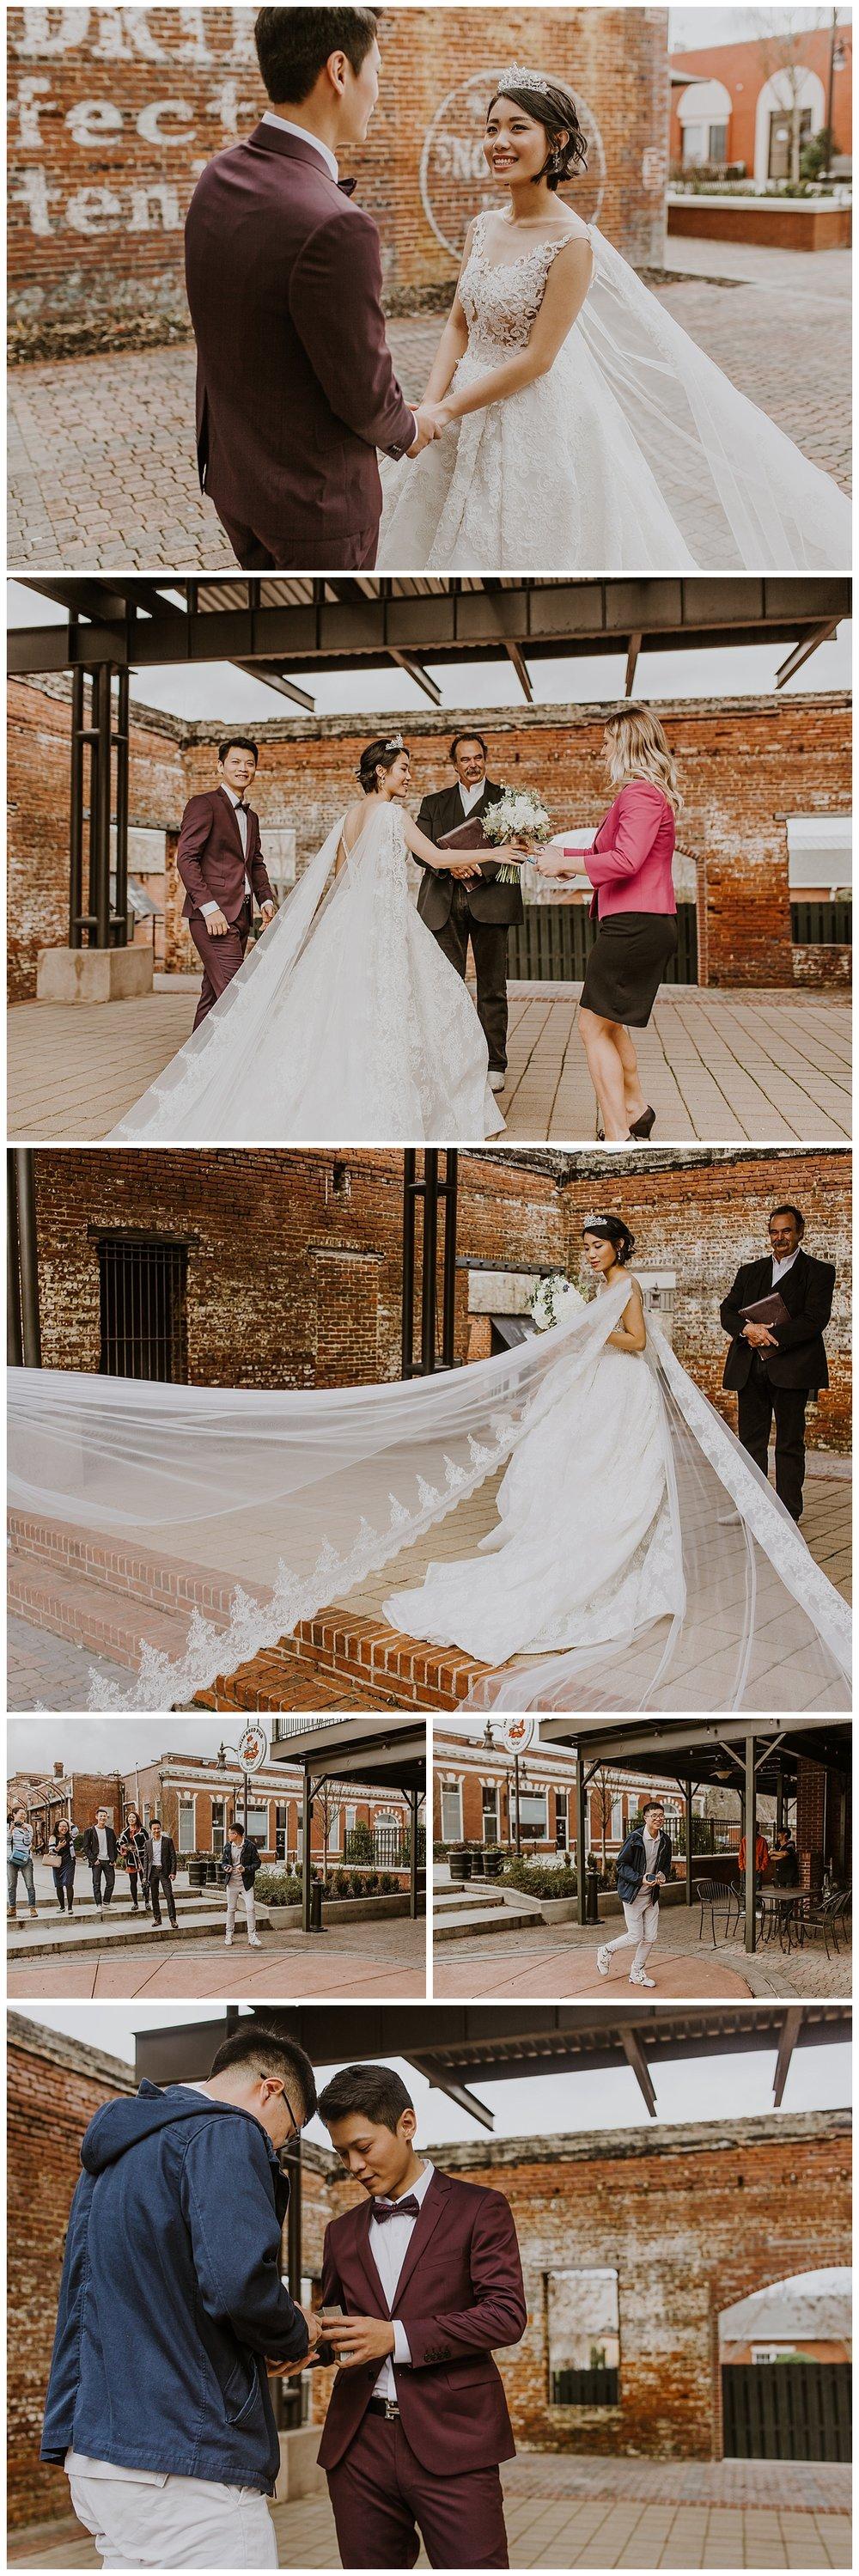 DOUGLASVILLE_GEORGIA_WEDDING_PHOTOGRAPHER_ELOPEMENT_ATLANTA_NATURAL_LIGHT_MOODY_SUNNY_0005.jpg